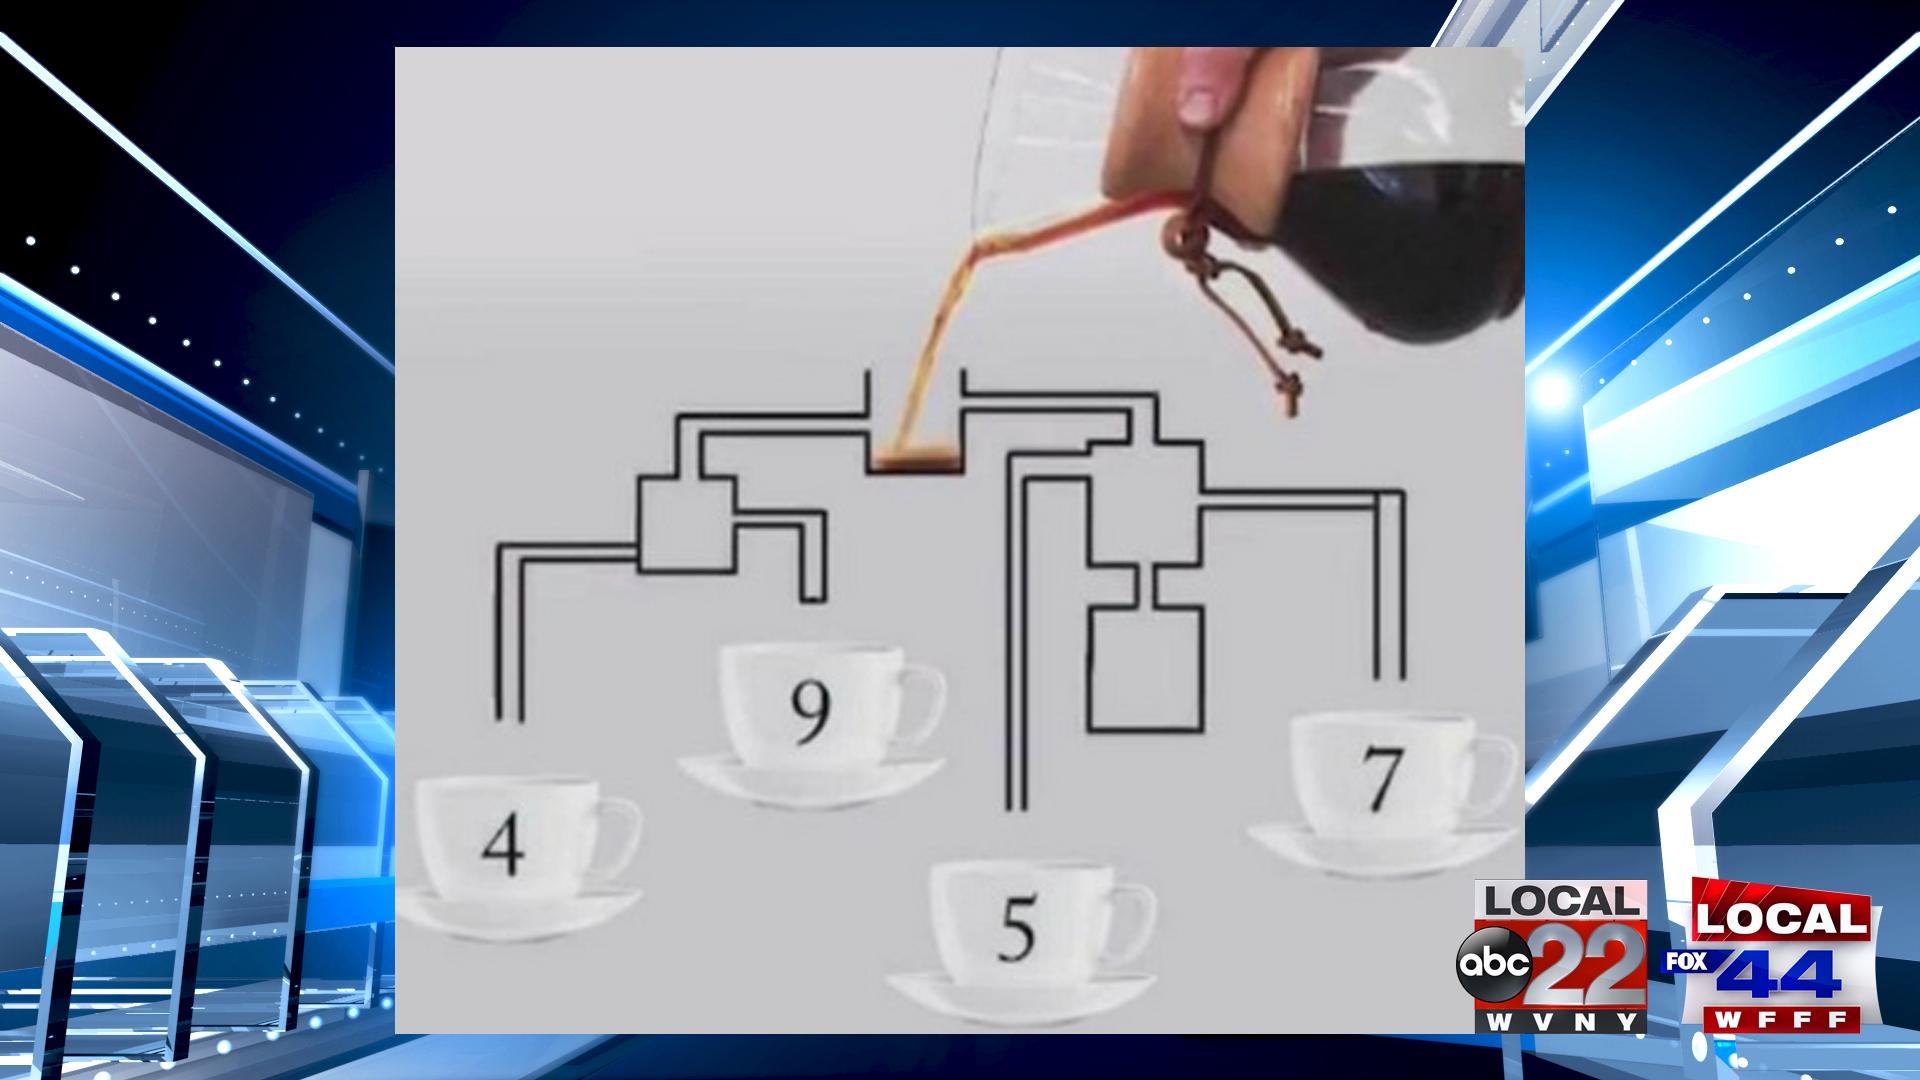 coffee riddle_1510939982837.jpg